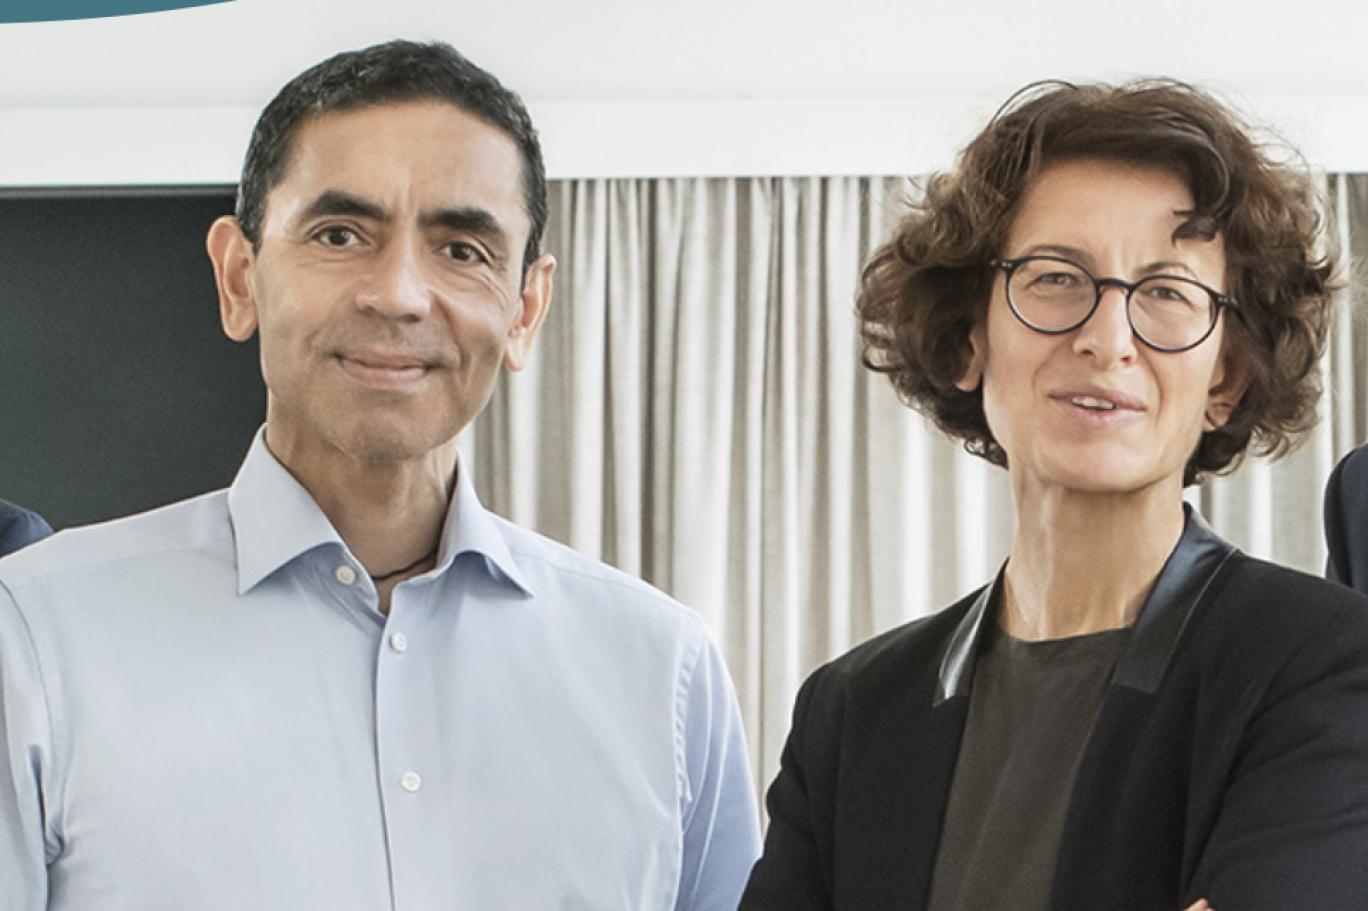 Prof Ugur Sahin (L) and Dr. Ozlem Tureci